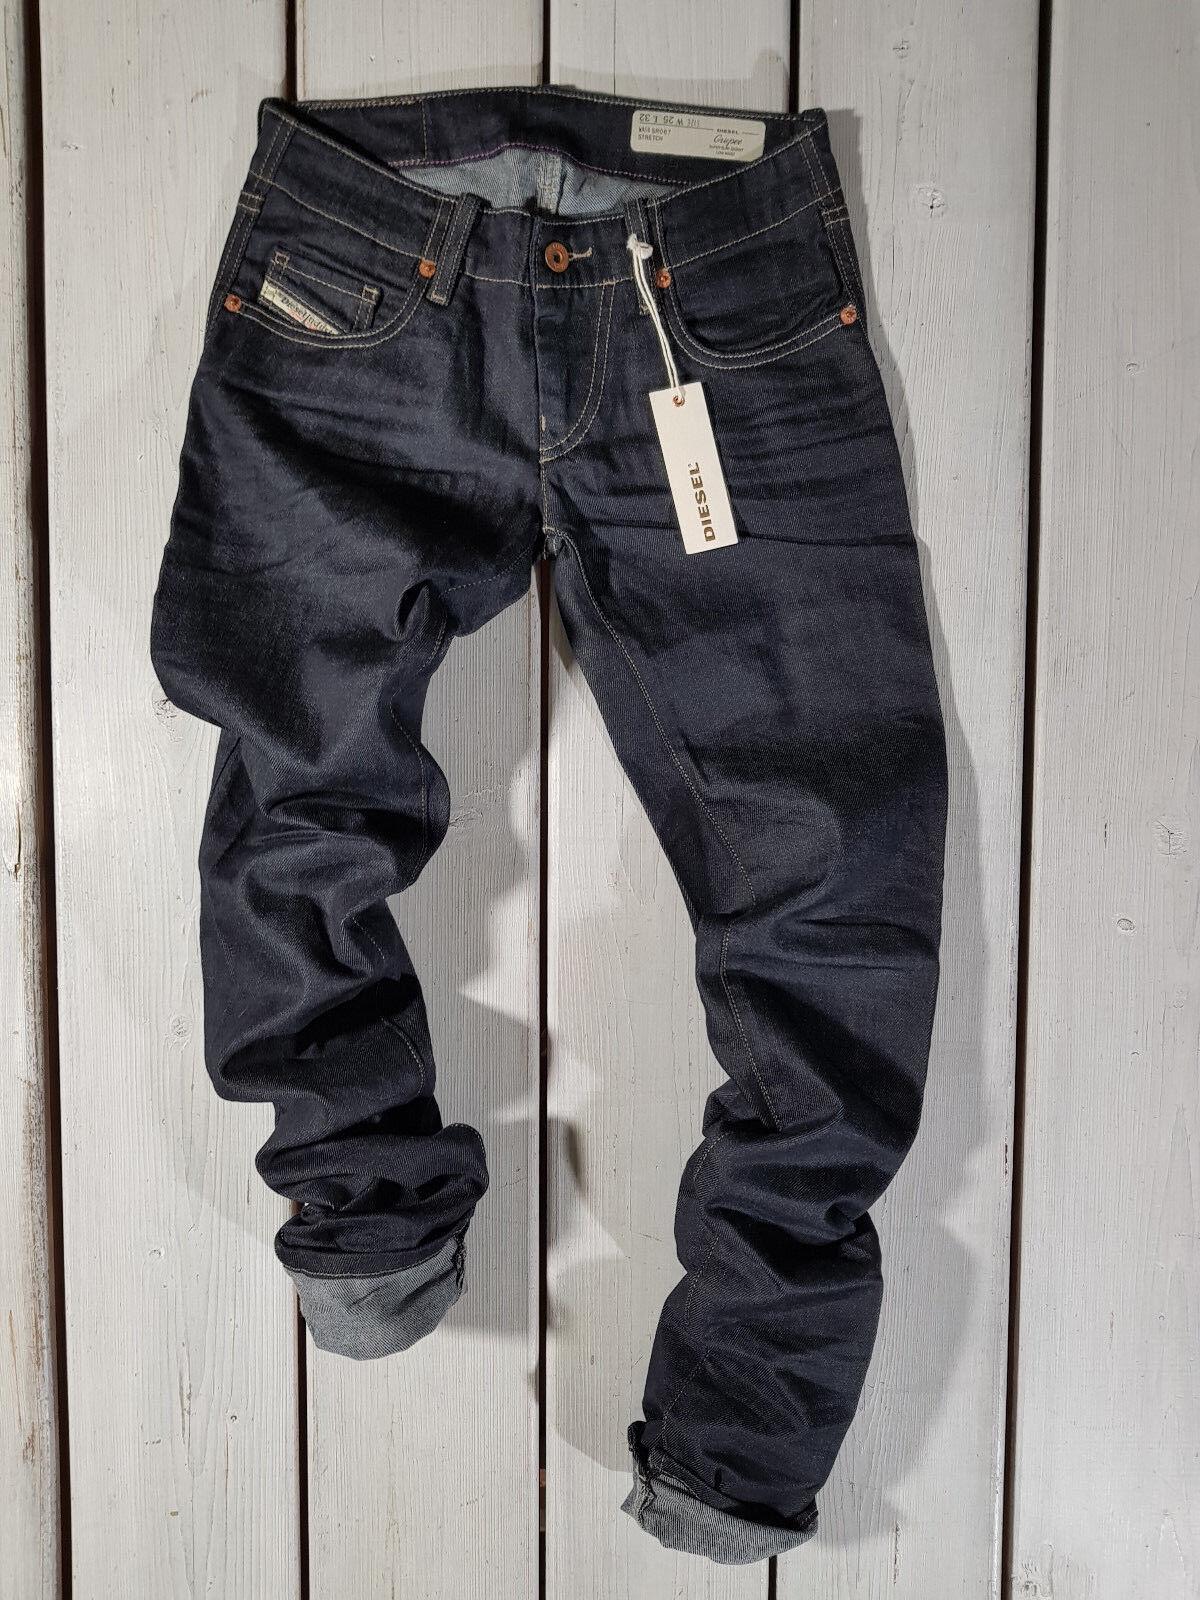 Nuovo Diesel DONNA Jeans Grupee Grupee Grupee W25 L32 Sr067 Super Slim Aderente Vita Bassa e2be37